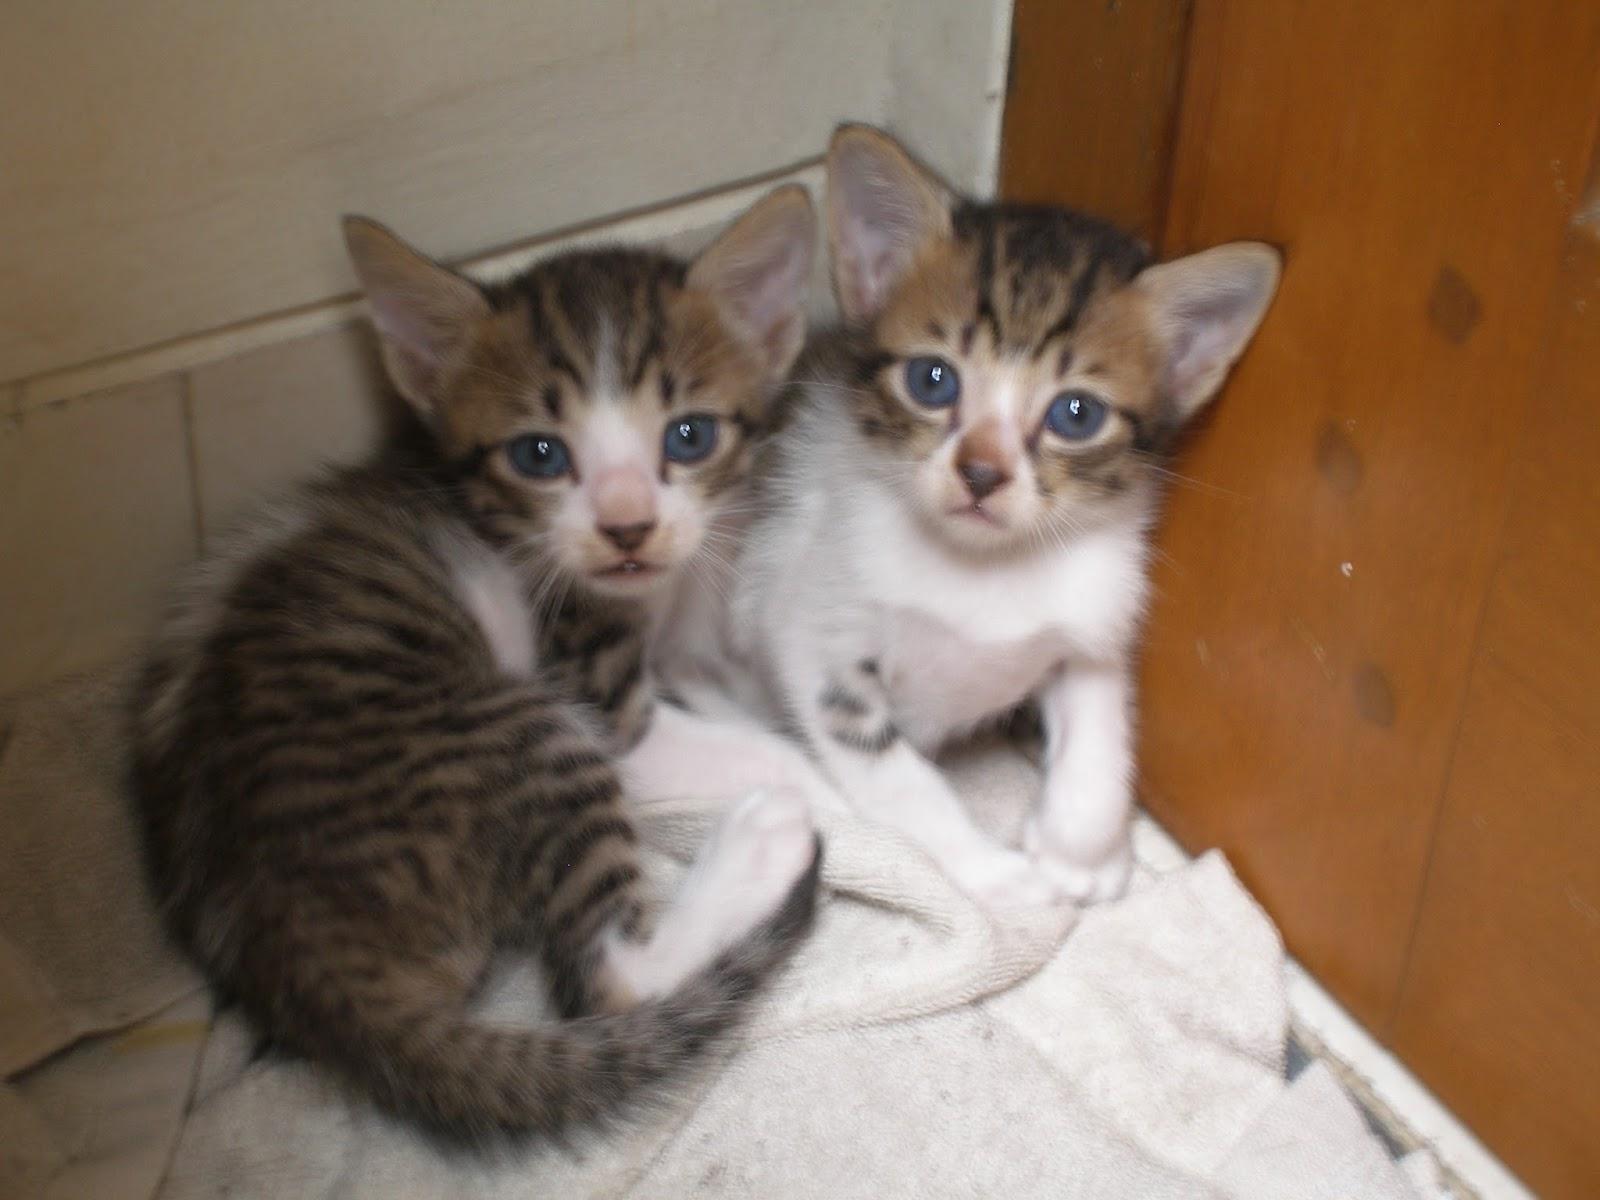 Unduh 61+  Gambar Kucing Persia Campuran Kampung Terbaik HD